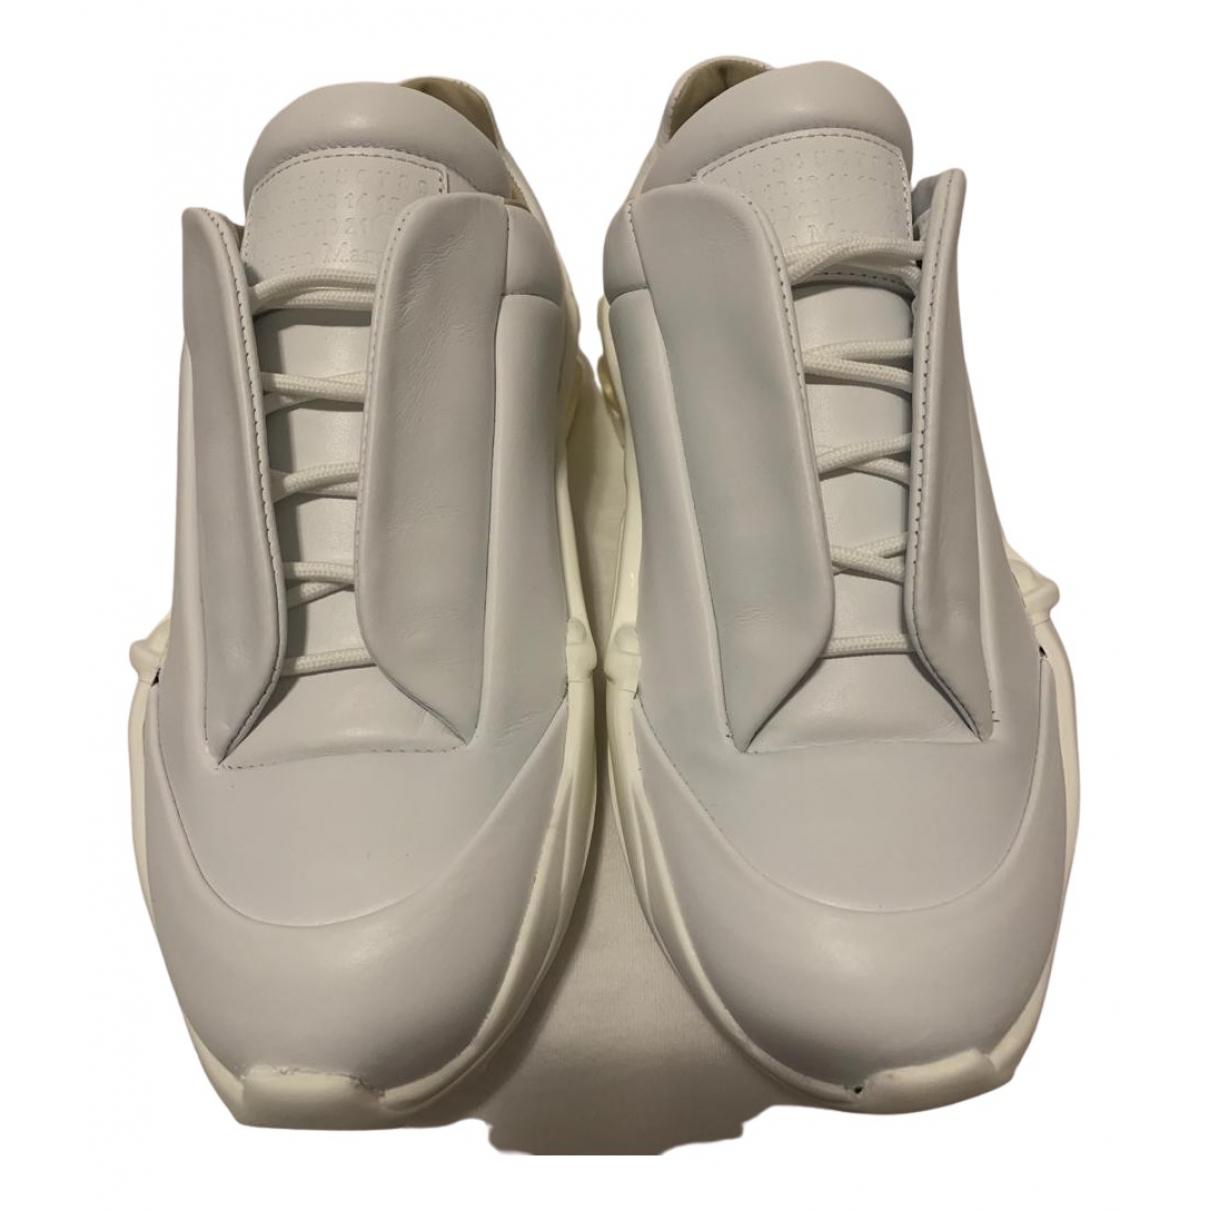 Maison Martin Margiela Future White Leather Trainers for Men 42 EU